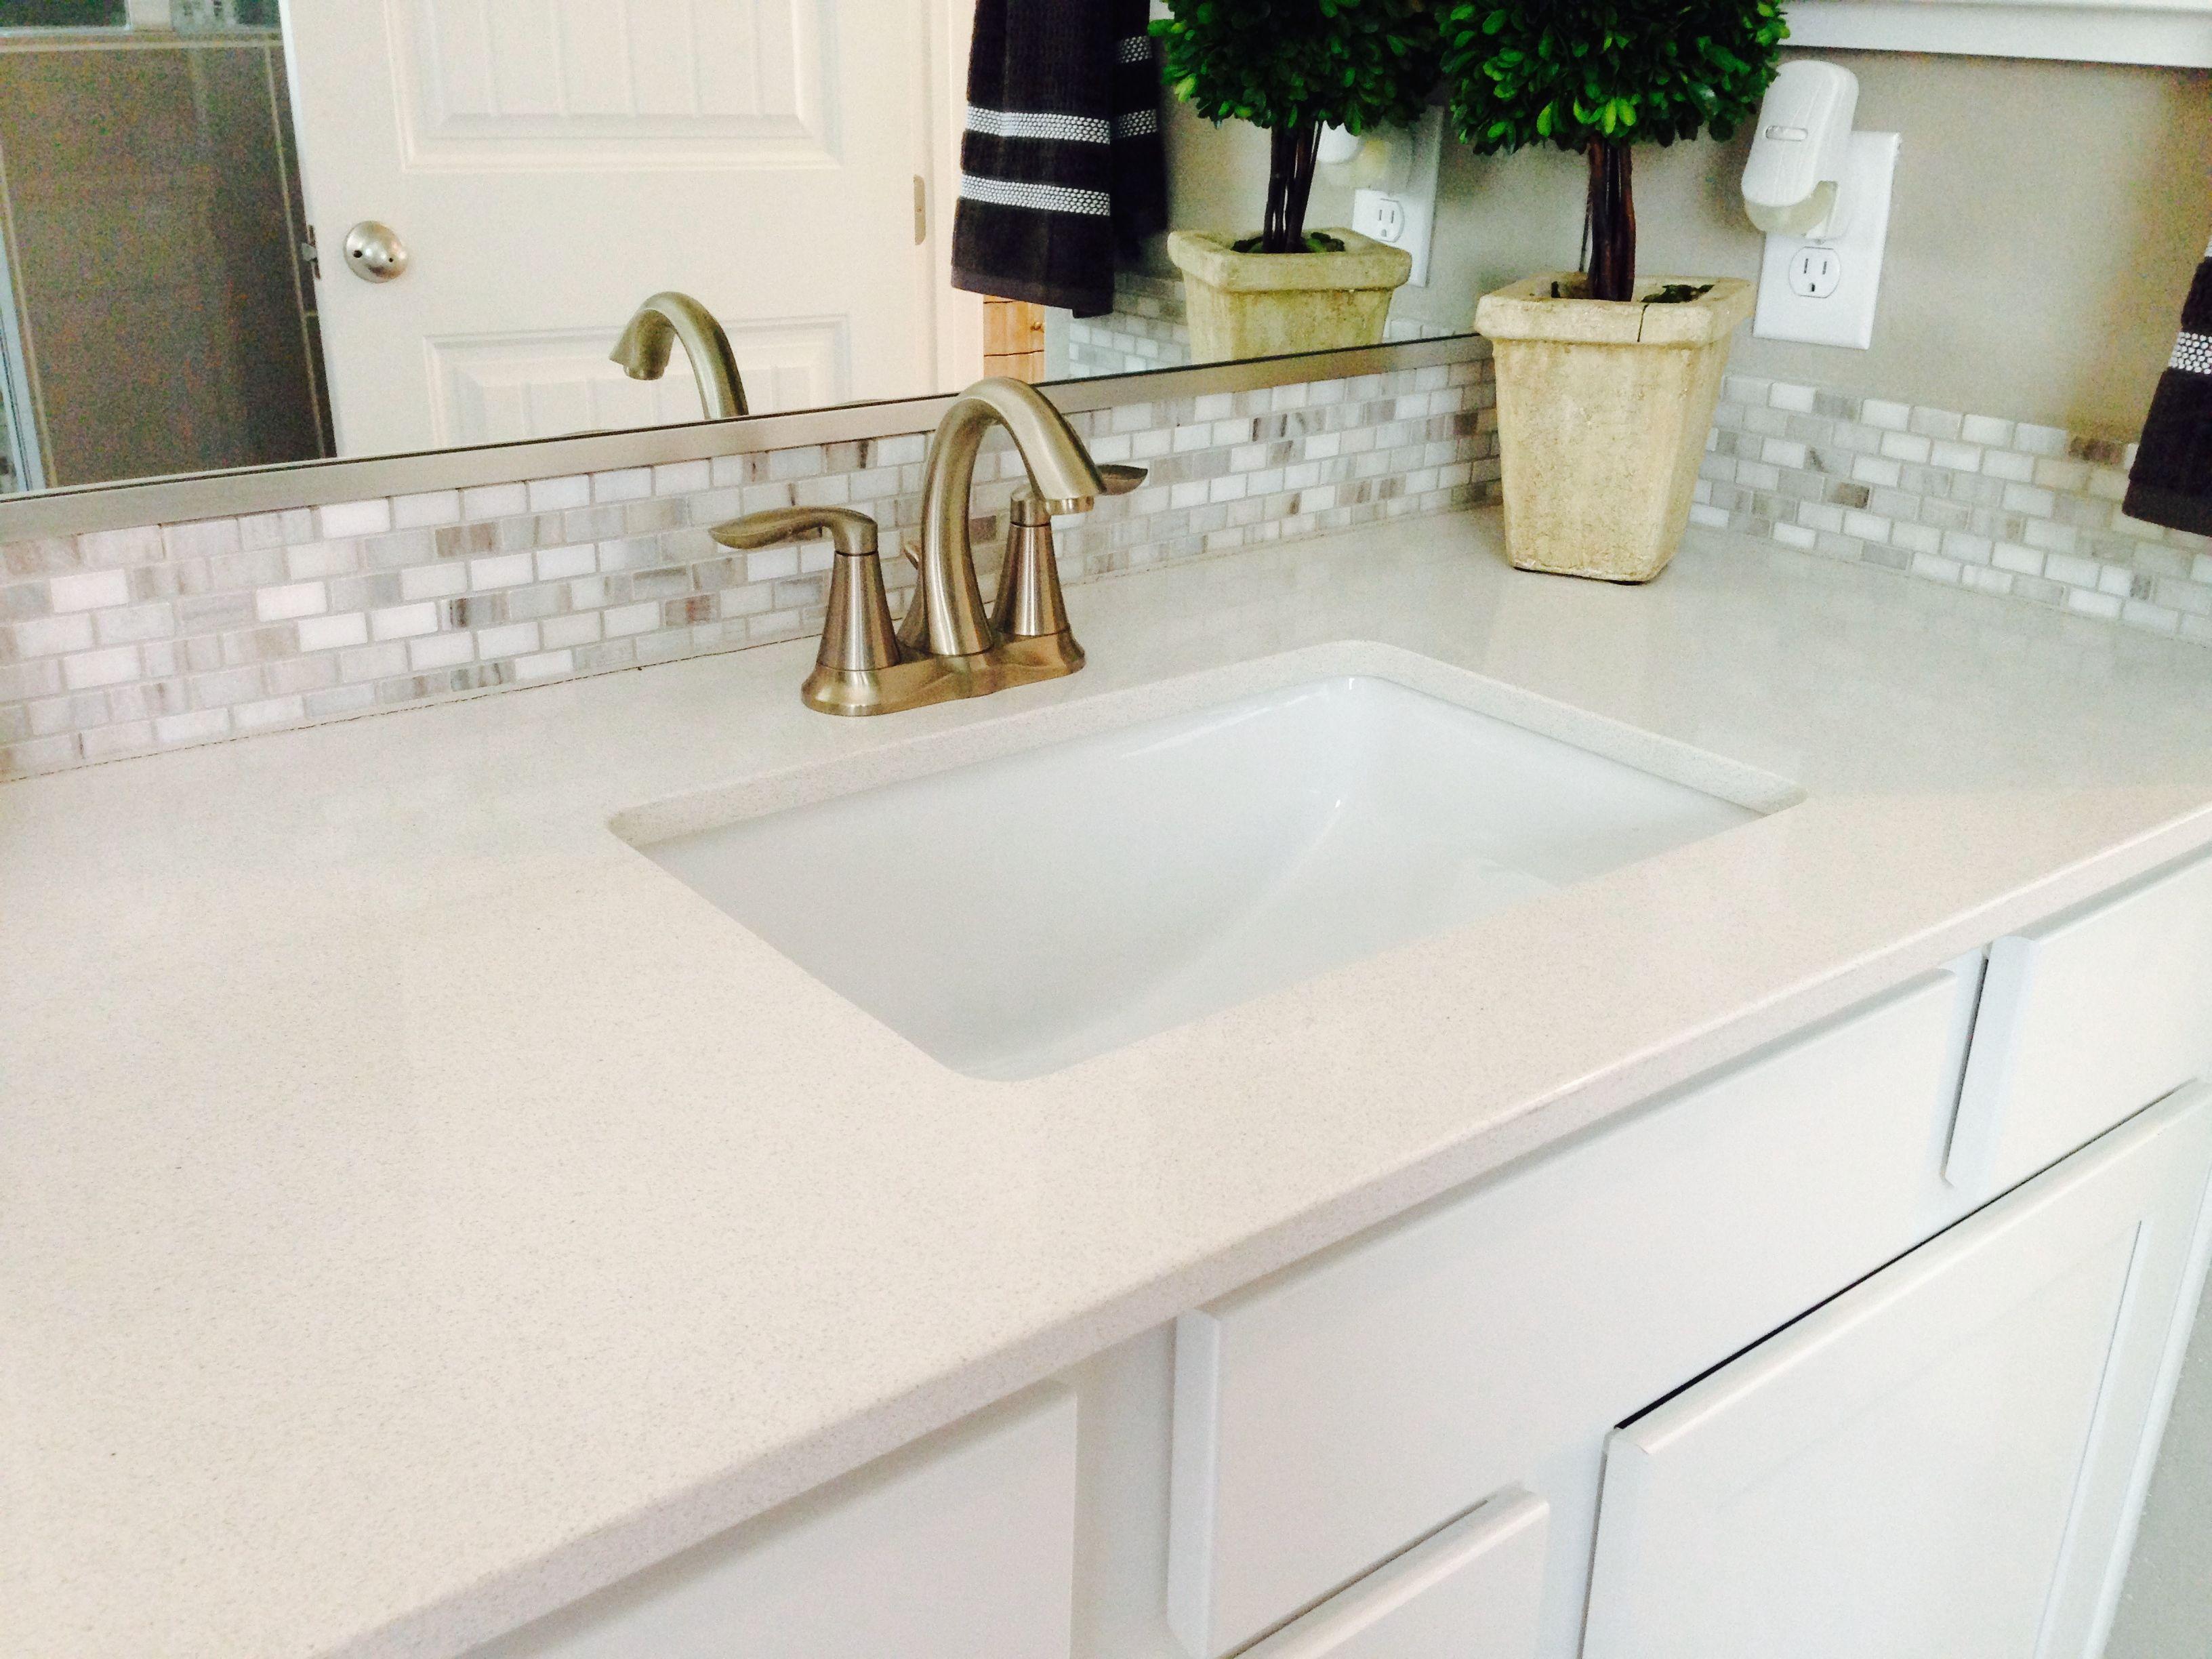 master bath vanity Silestone counter with decorative mosaic tile ...